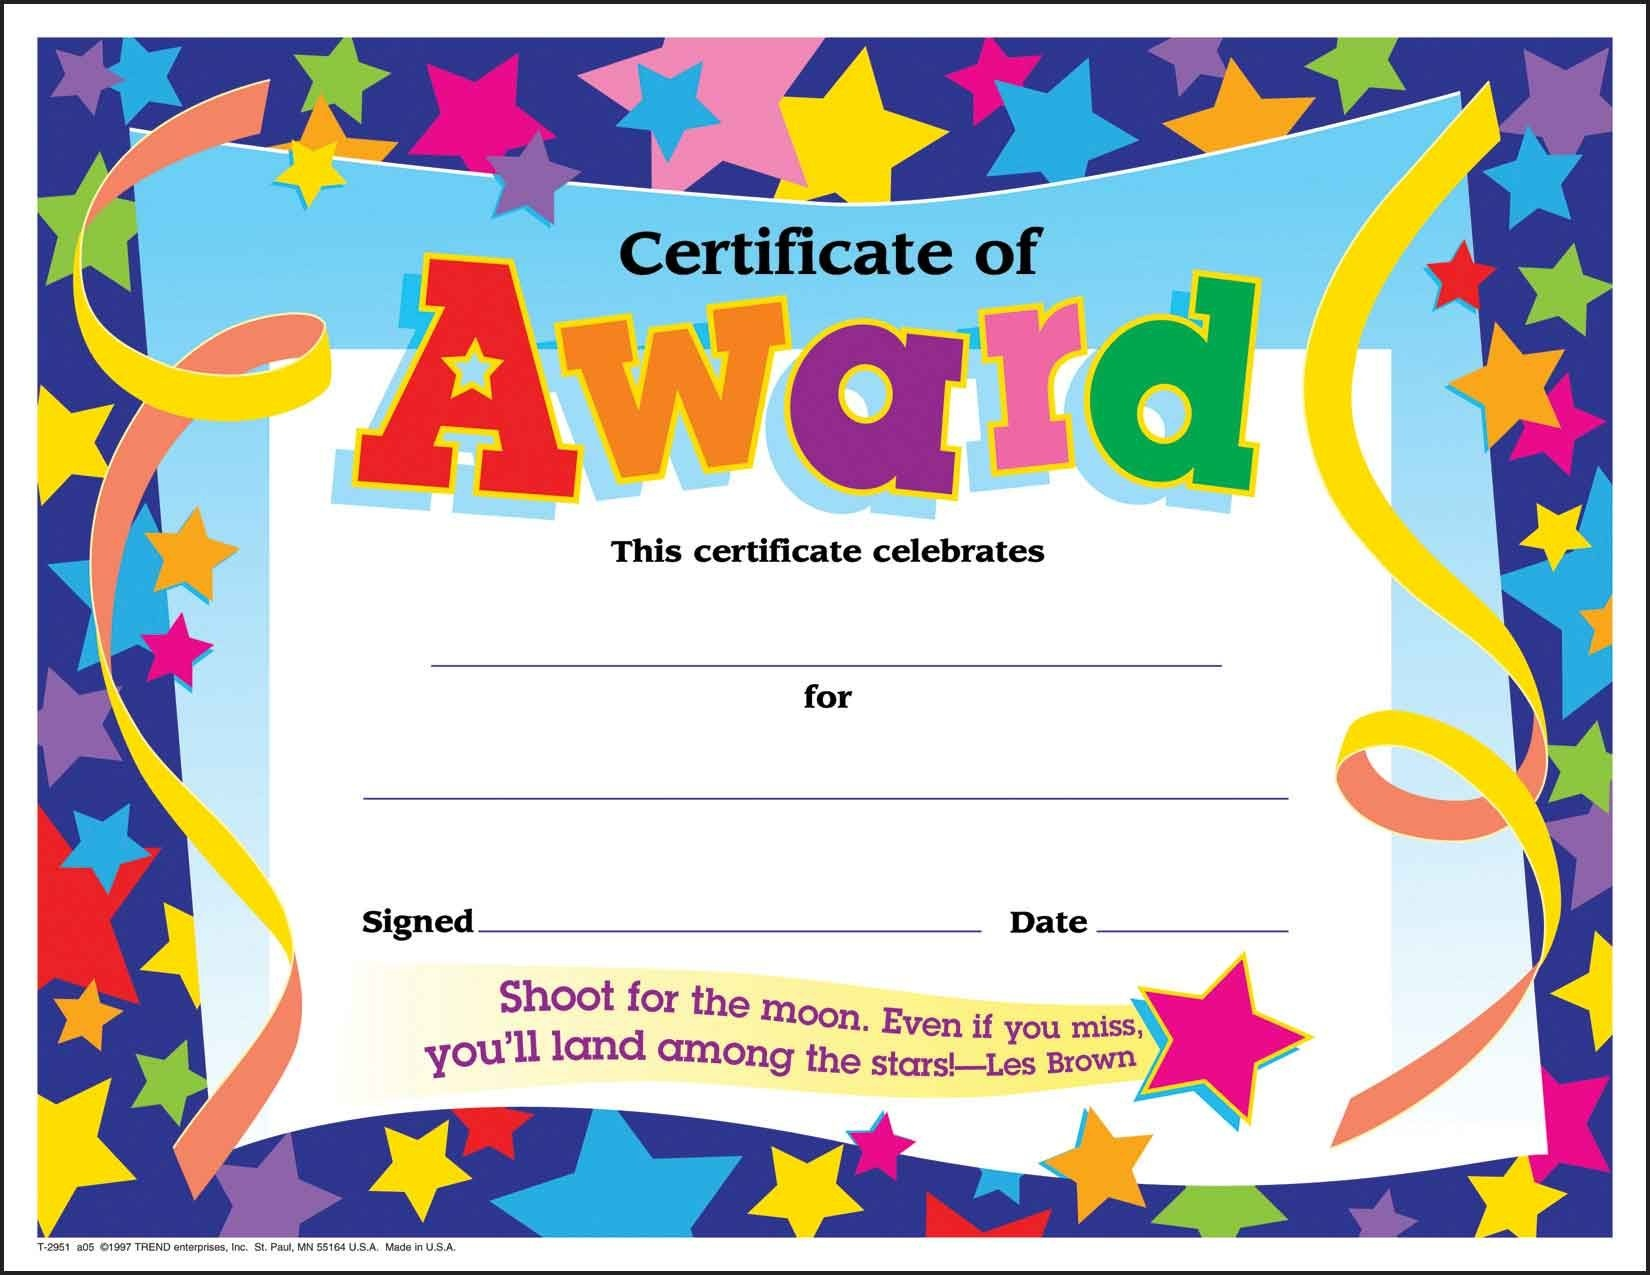 Printable Kids Certificate - Tutlin.psstech.co - Free Printable Children's Certificates Templates